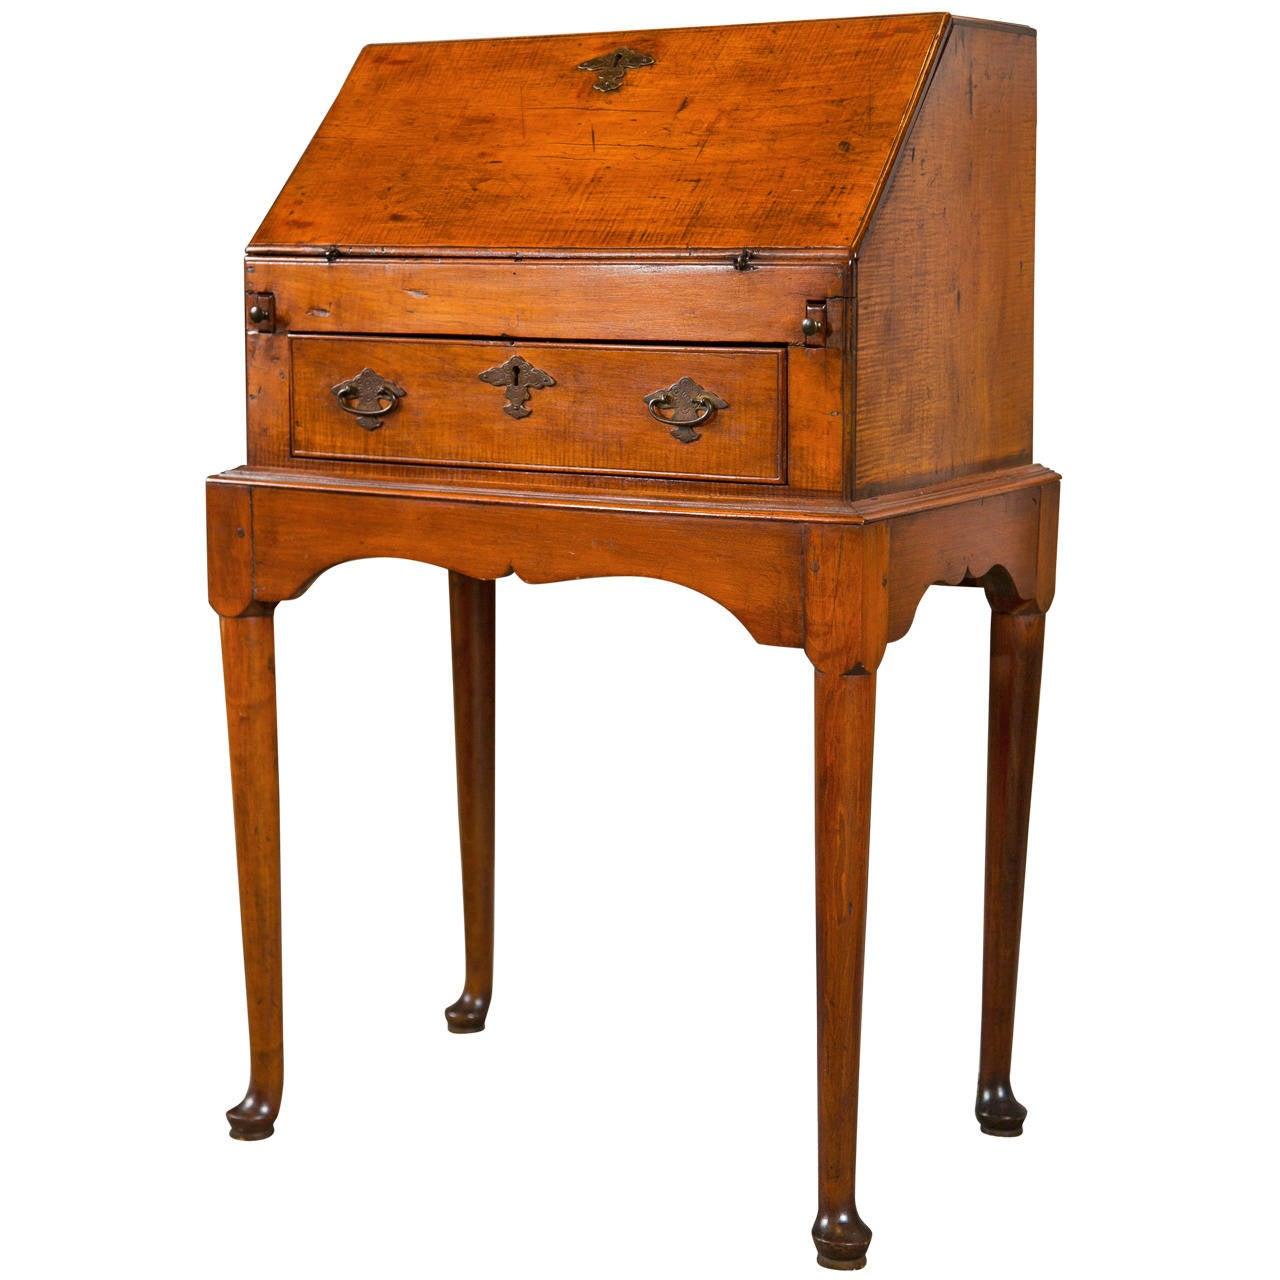 19th century slant front desk for sale at 1stdibs